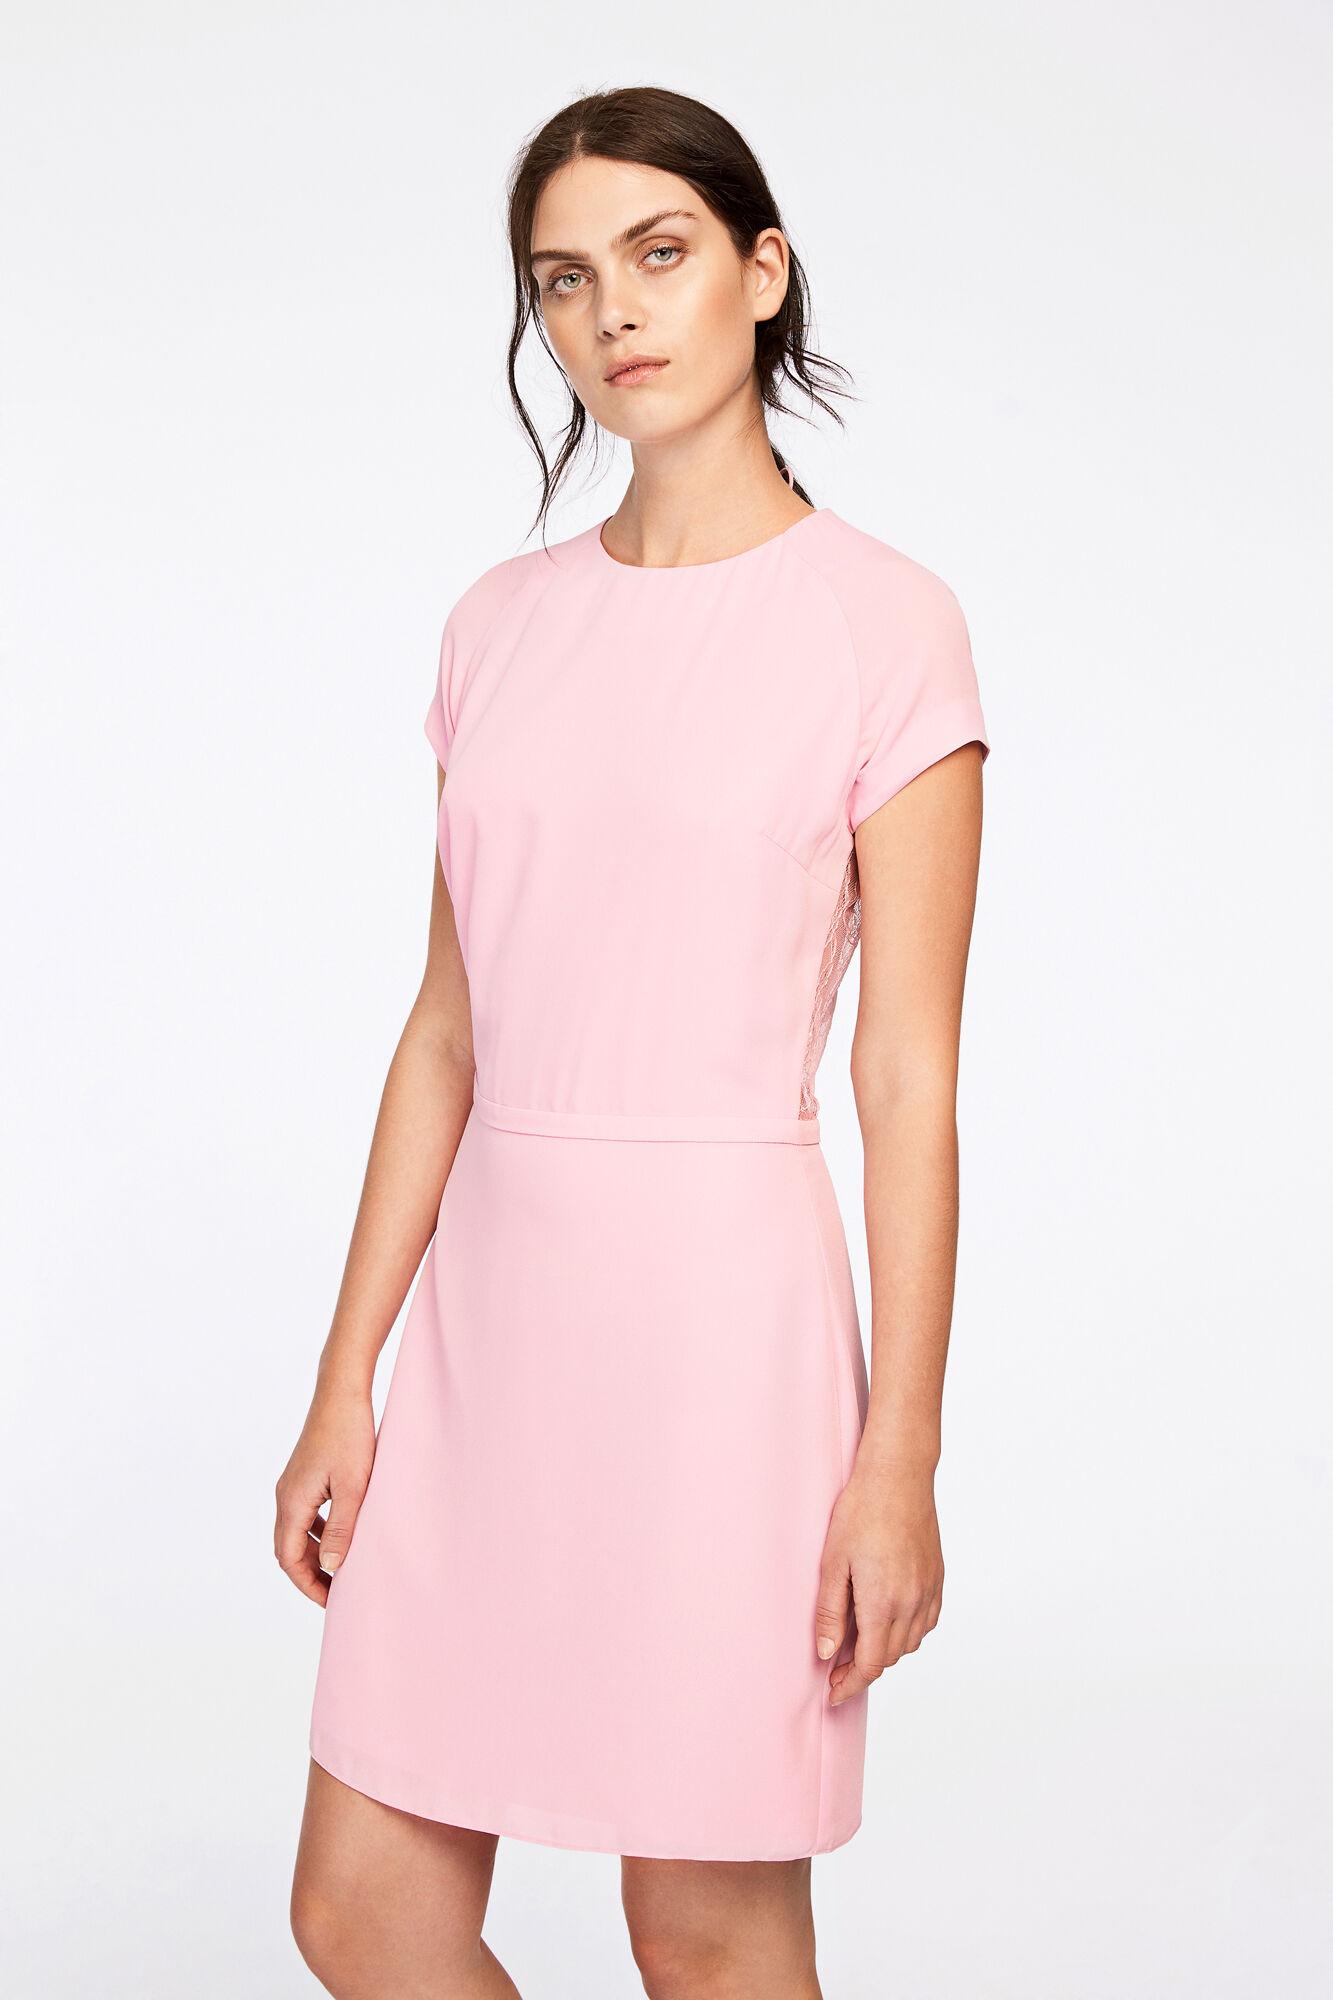 Isar s dress 3973, LILAC SACHET